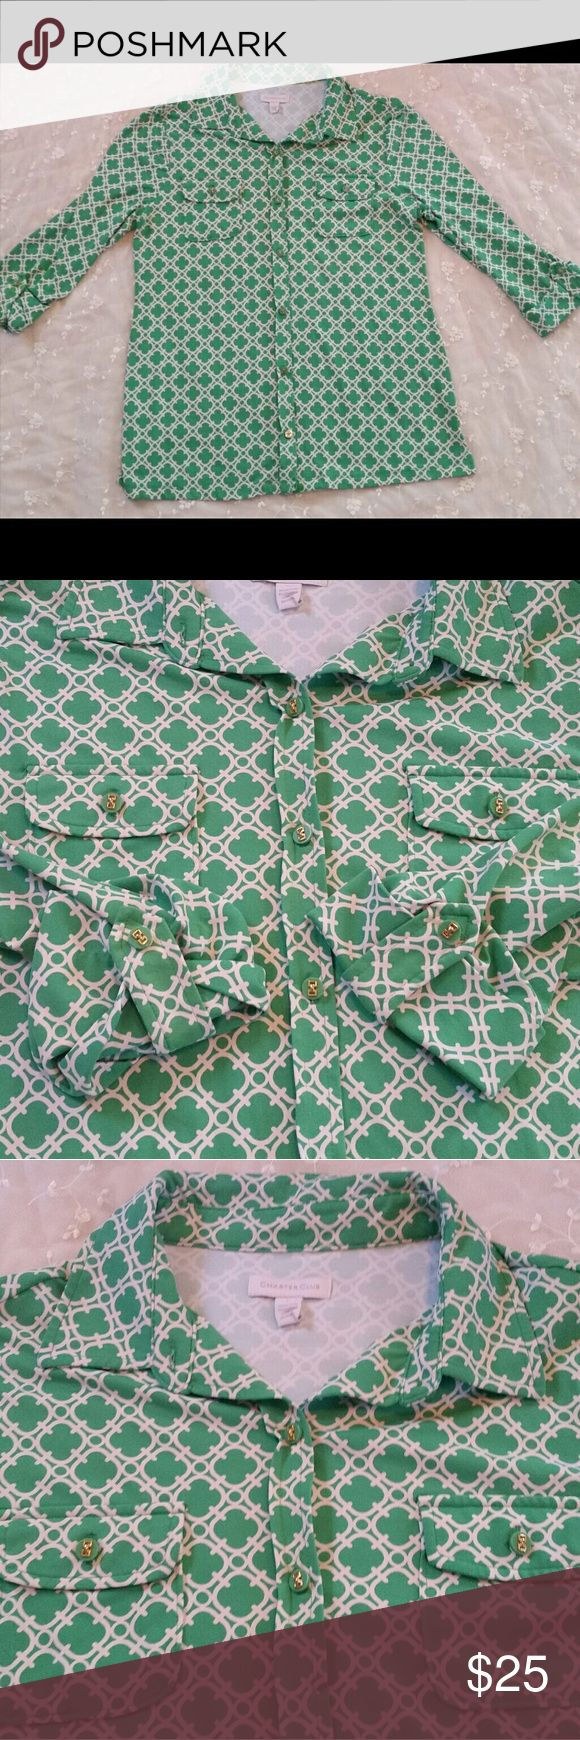 Green & White Patterned Charter Club Shirt Beautiful green & white geometric pat…